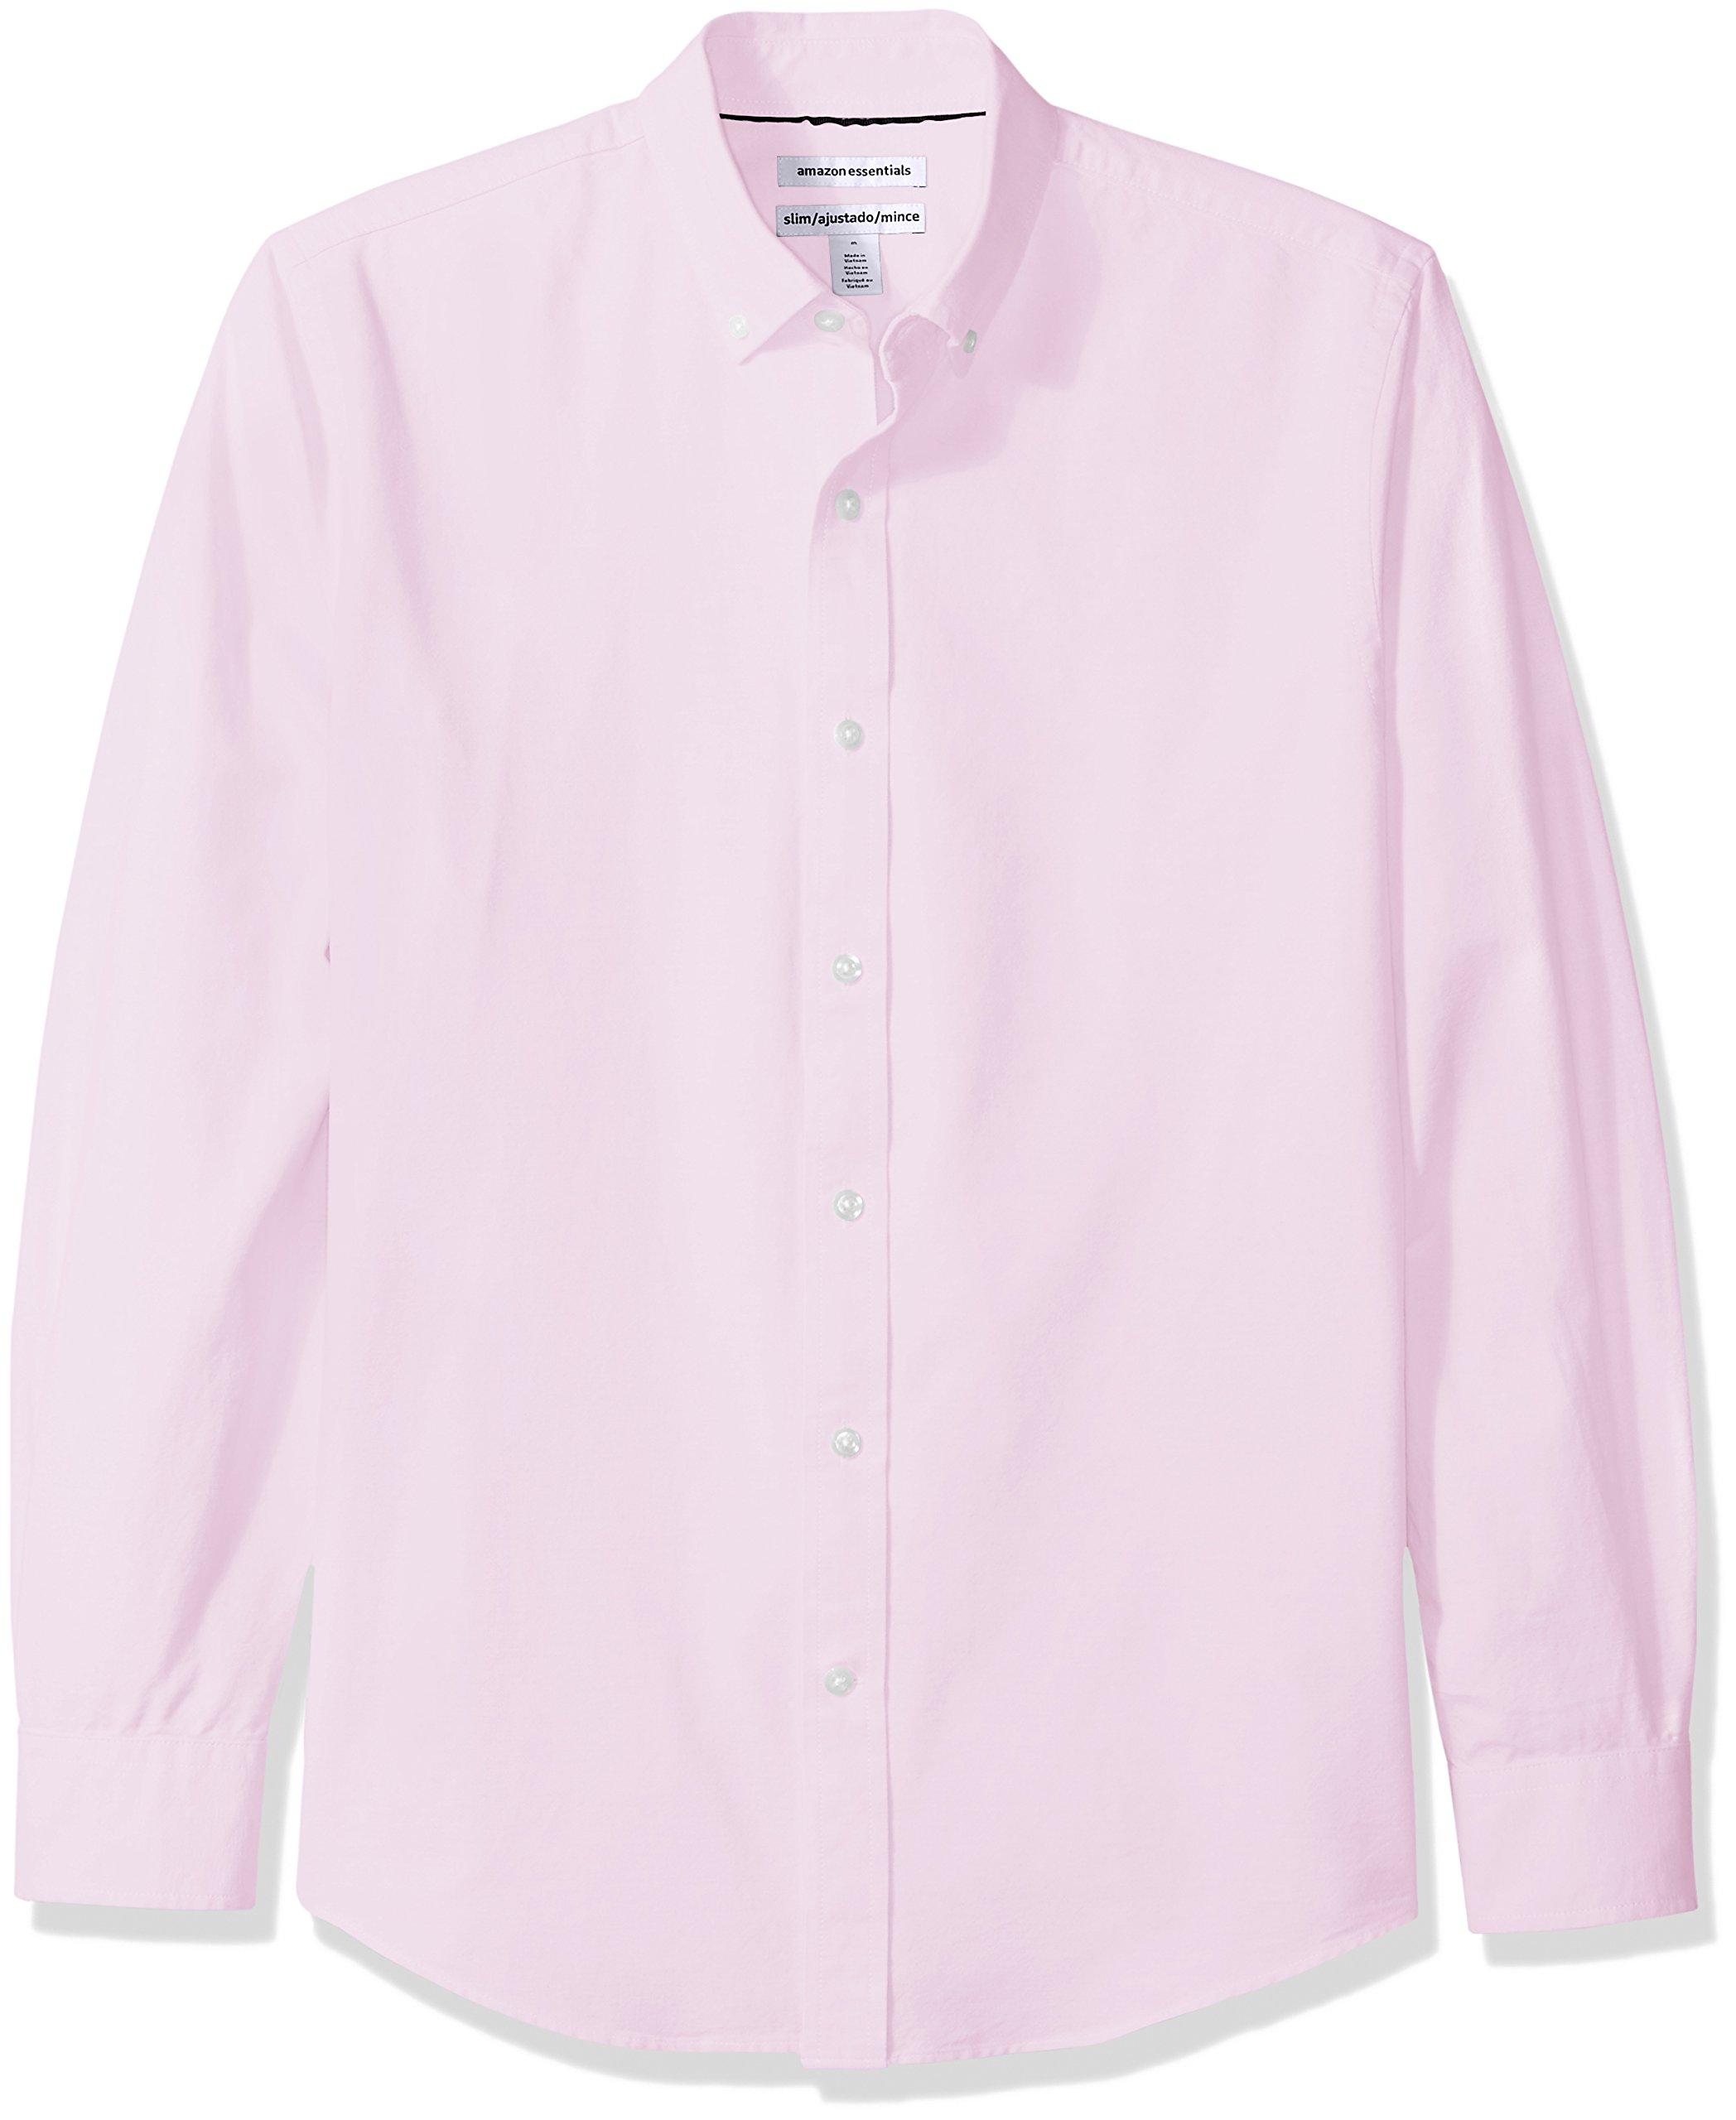 Amazon Essentials Men's Slim-Fit Long-Sleeve Solid Oxford Shirt, Pink, Medium